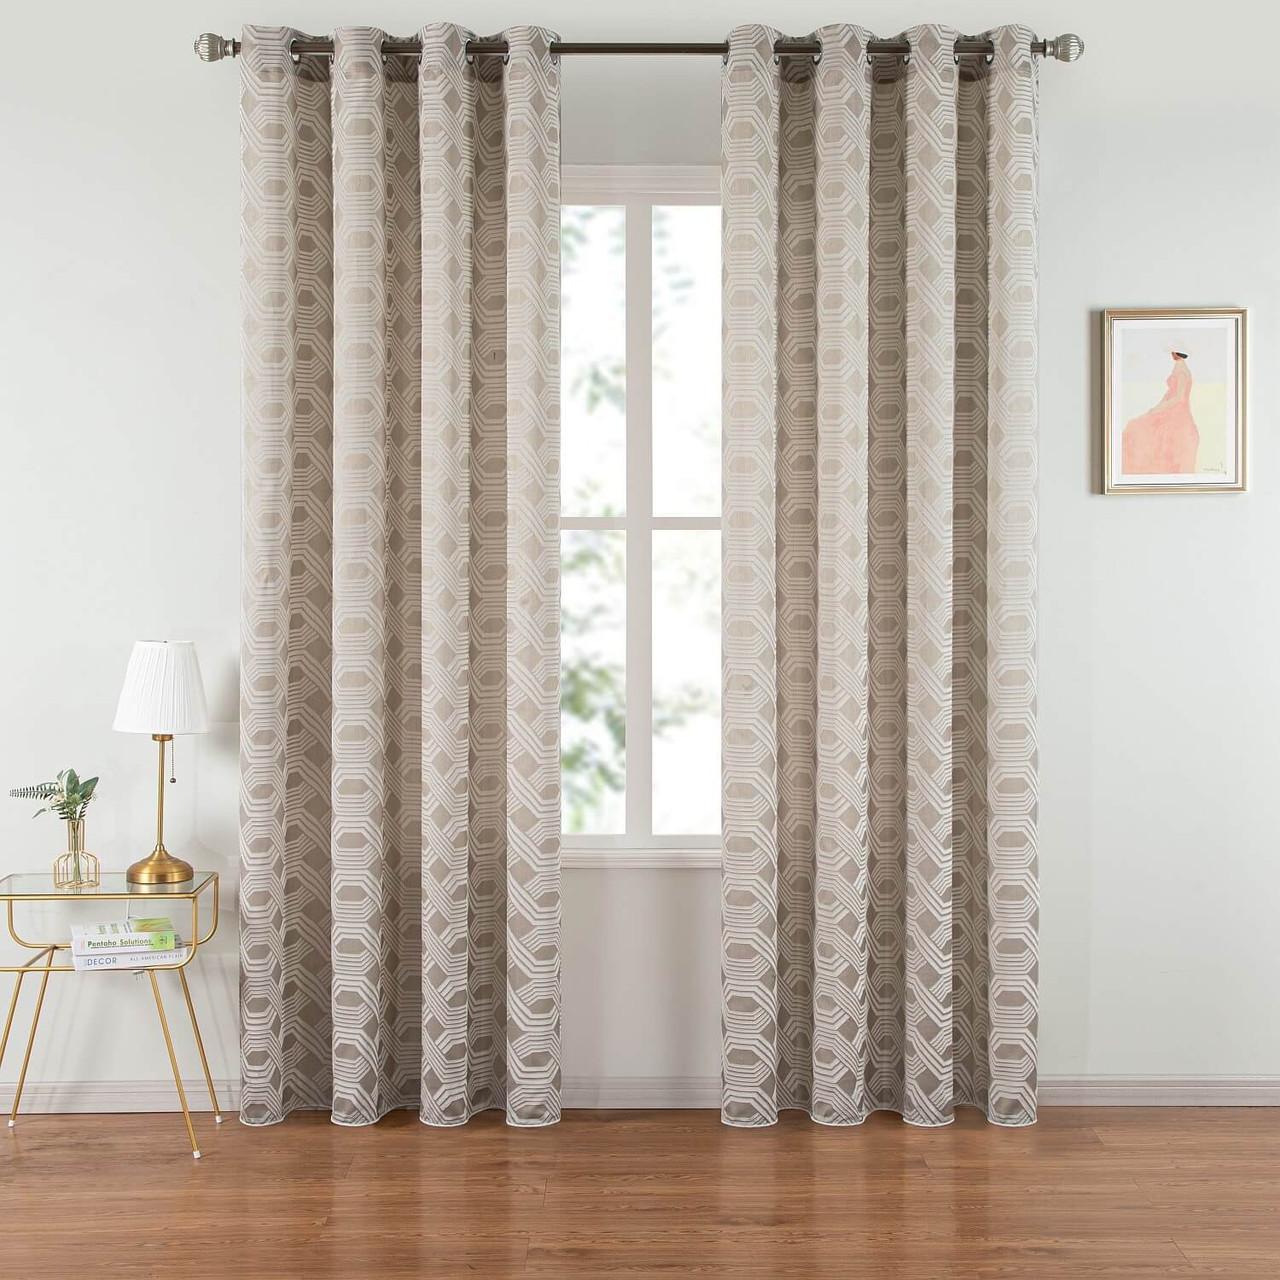 Curtain Panel Grommet-Top Window Treatments DMC501